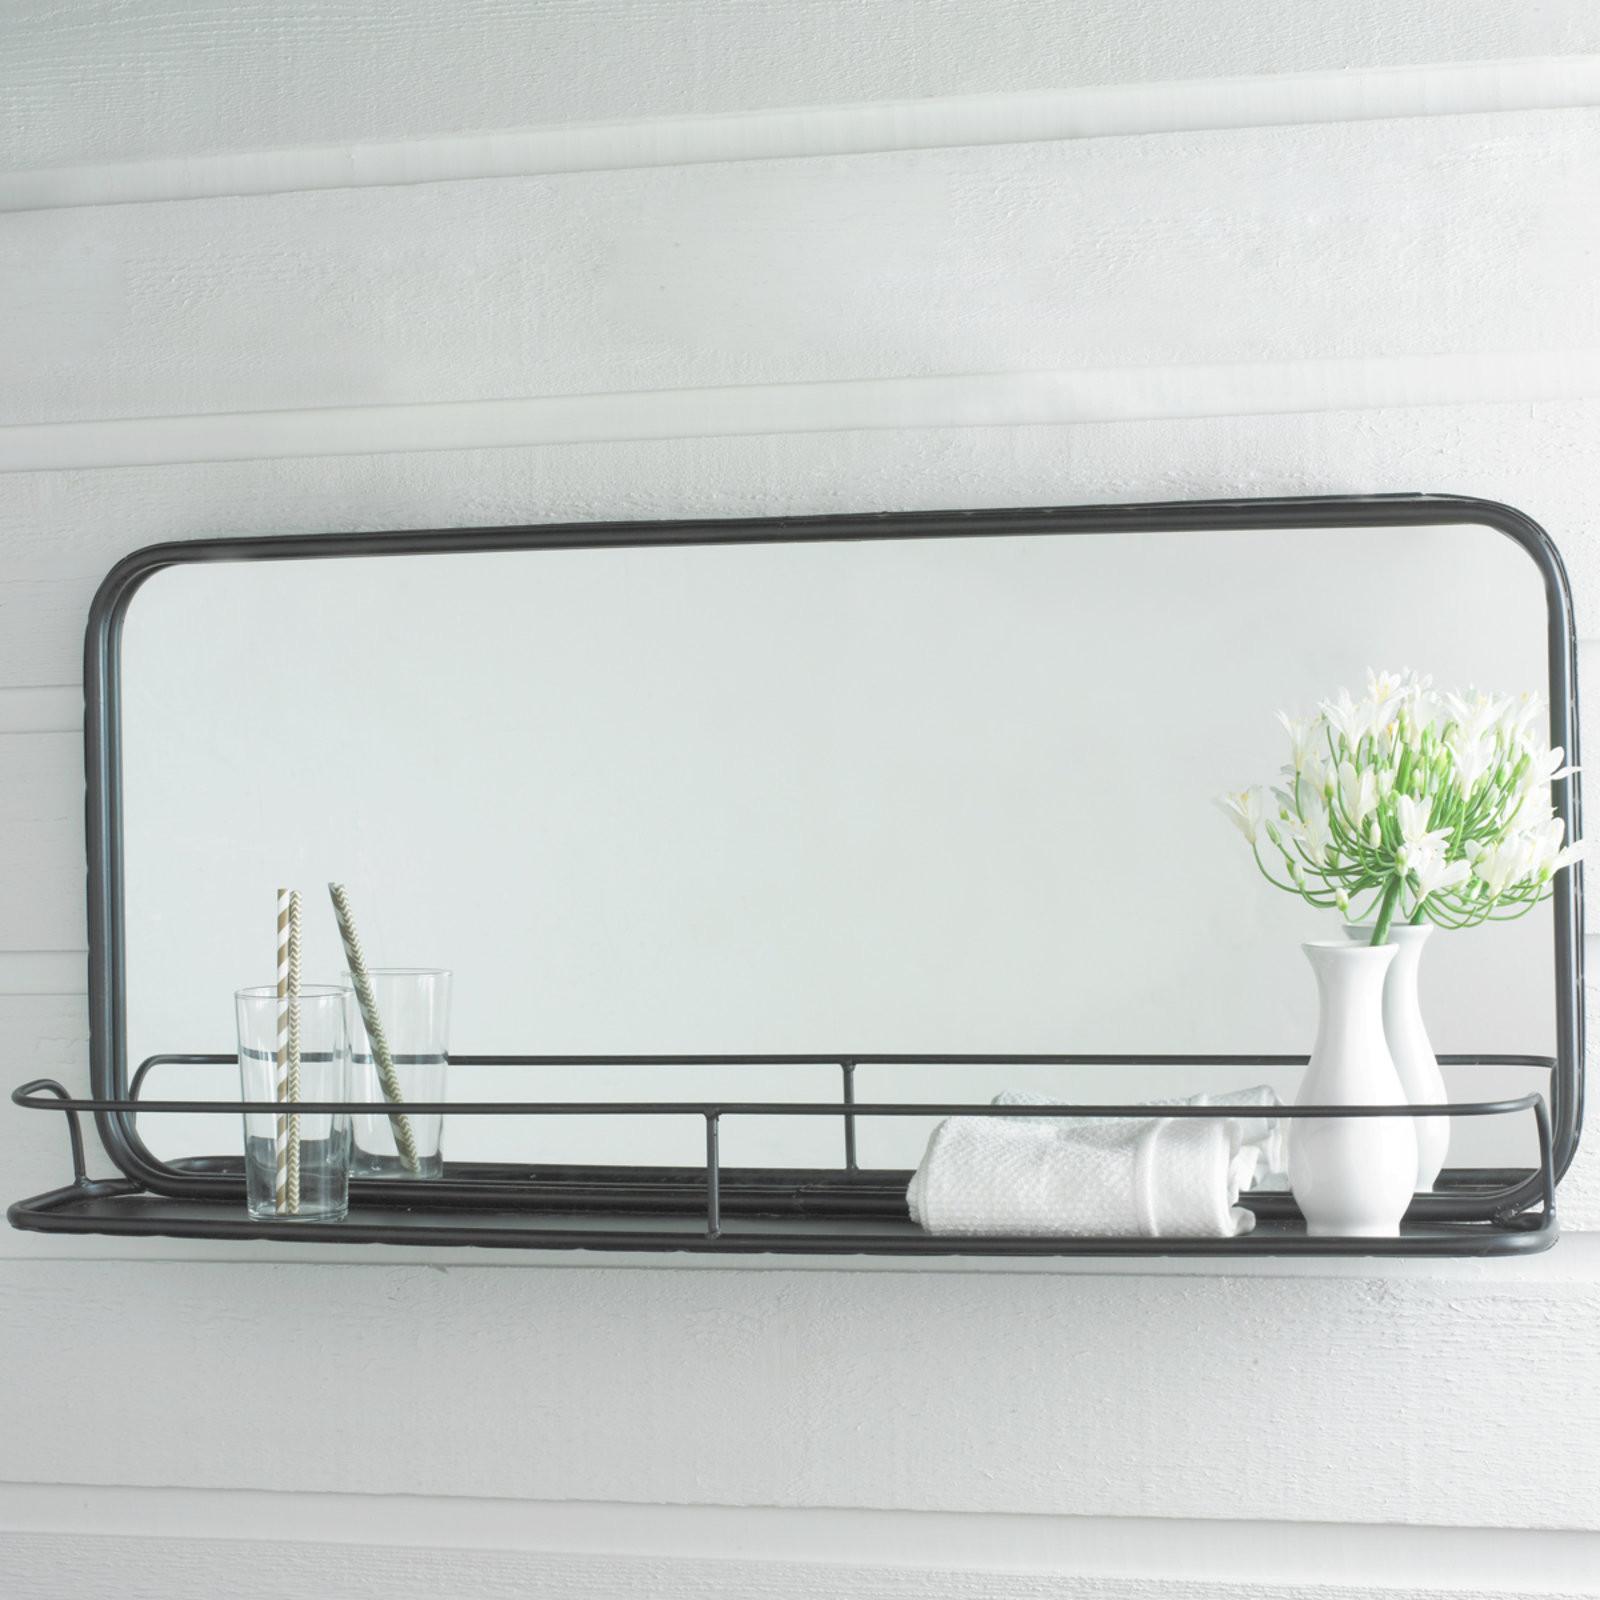 Metal Framed Mirrors Bathroom  Metal Mirror with Shelf Shades of Light